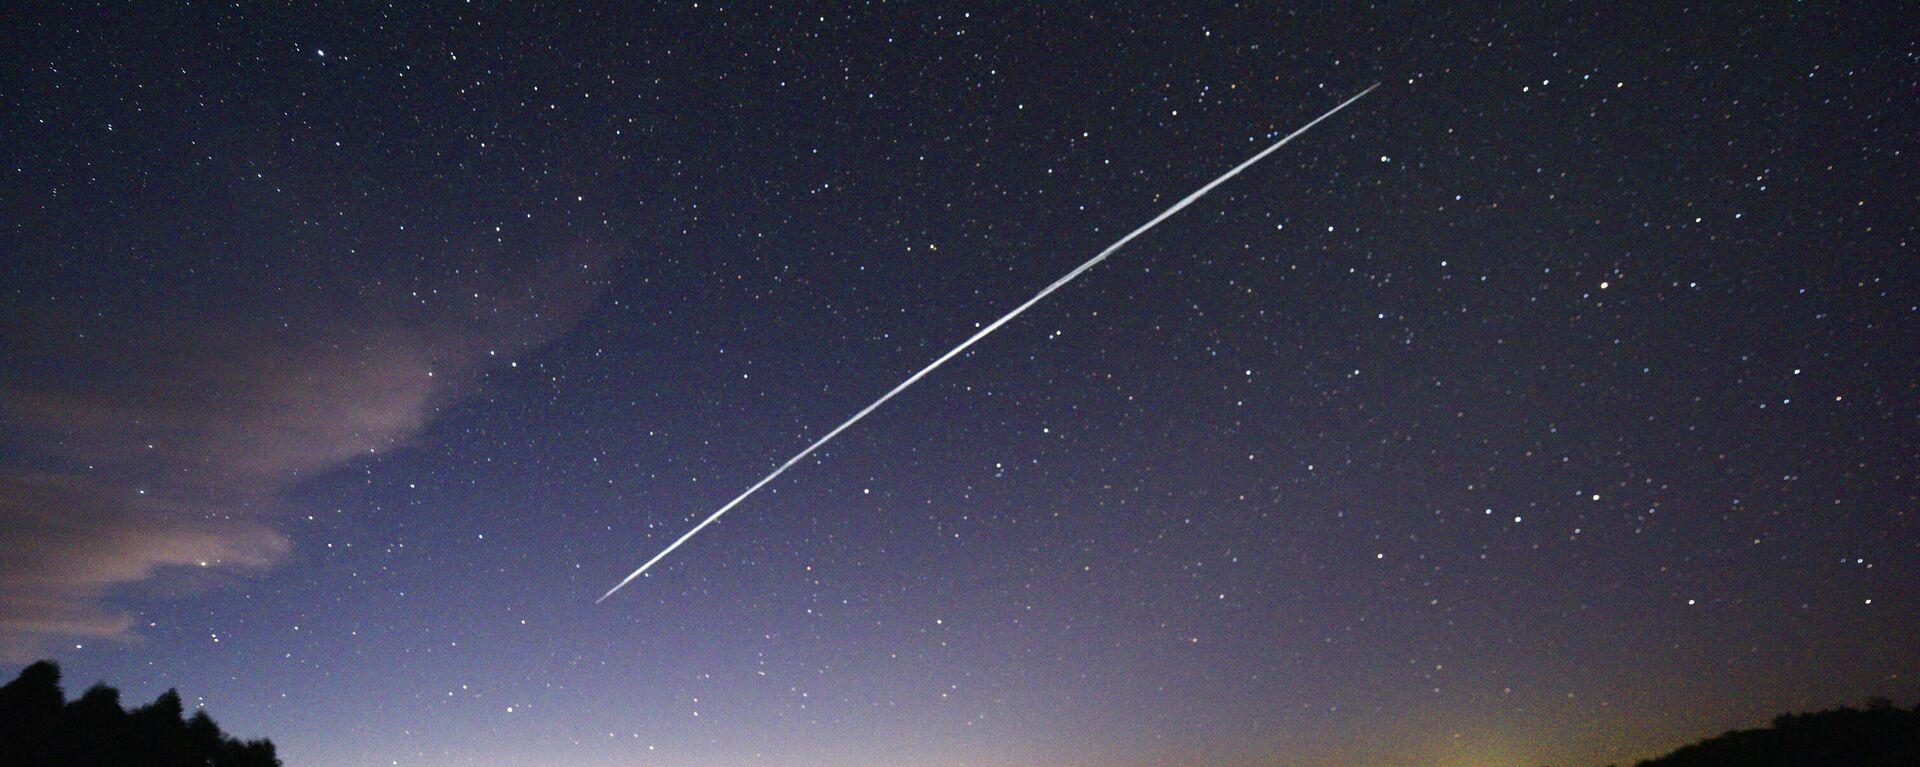 Estela de un grupo de satélites Starlink de SpaceX  - Sputnik Mundo, 1920, 30.04.2021